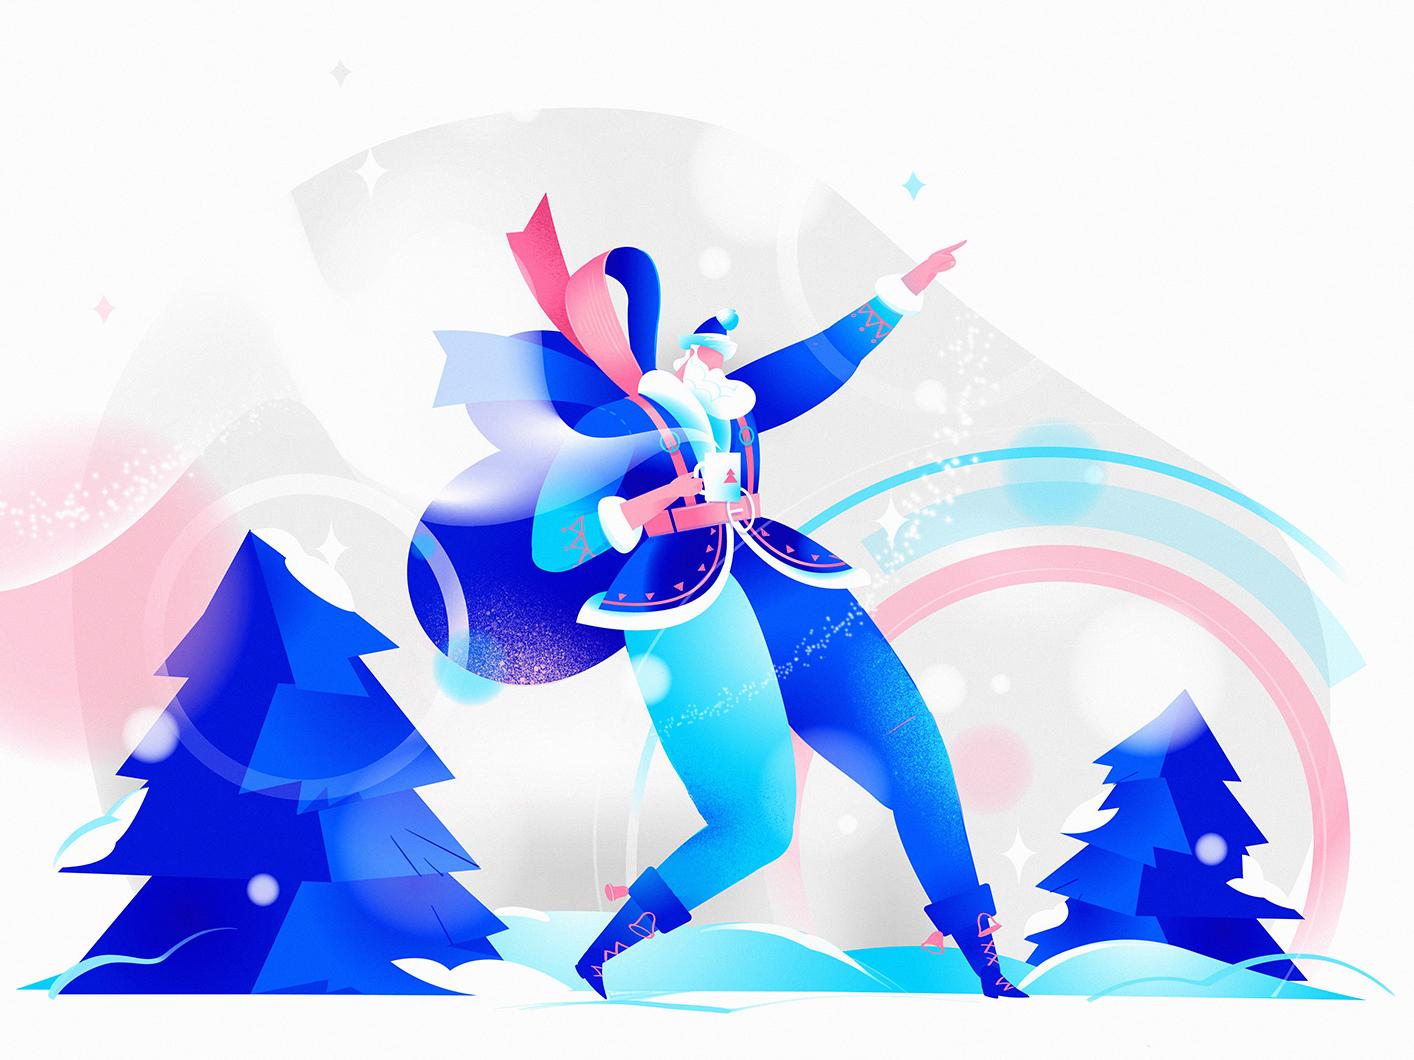 Santa Cool wow hurca yeah xmas card snow christmas cool colors faxhion glam cool santa claus